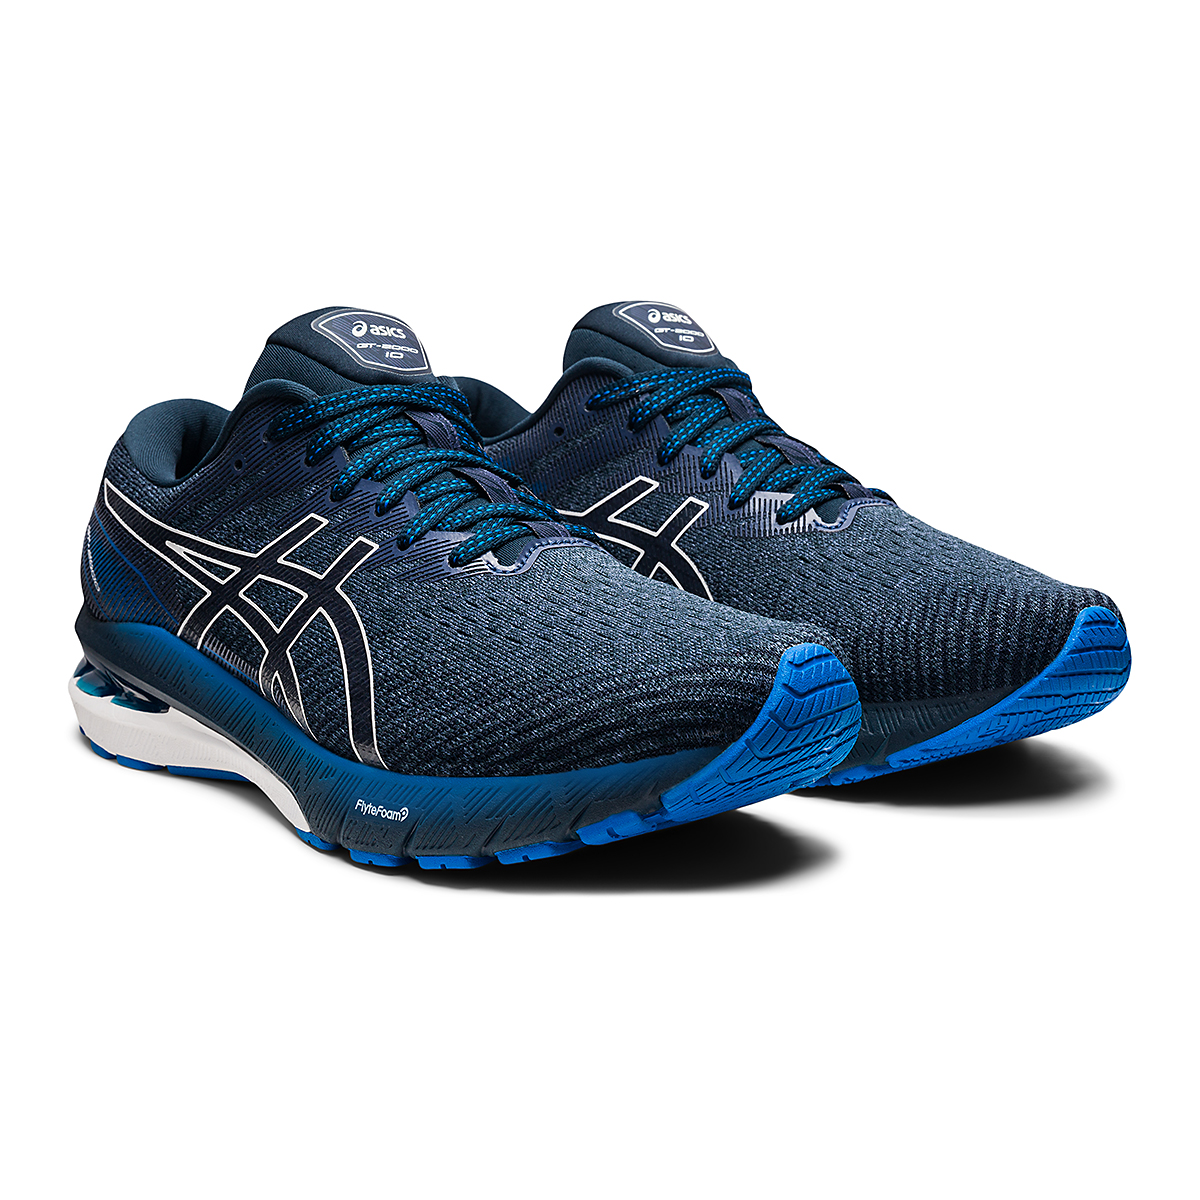 Men's Asics GT-2000 10 Running Shoe - Color: Thunder Blue/French Blue - Size: 7 - Width: Regular, Thunder Blue/French Blue, large, image 3